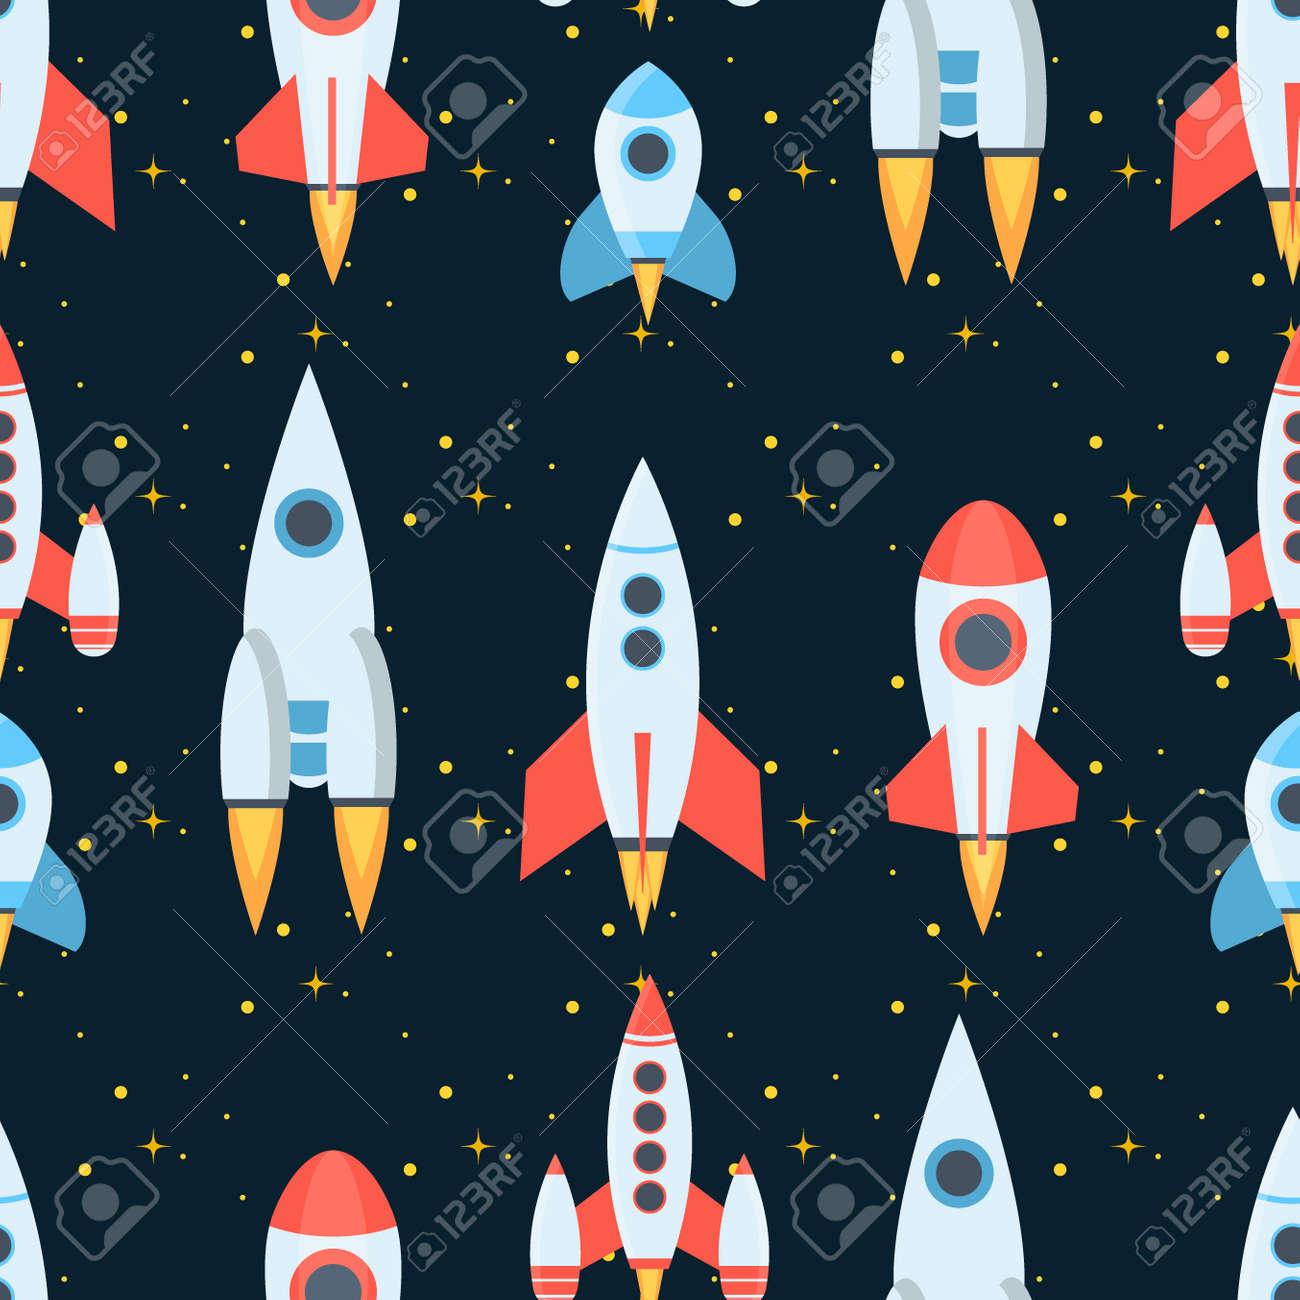 Rocket space globe solar system and planet cosmos sky seamless pattern background vector illustration. Flight spacecraft astronaut exploration travel shuttle. Cosmonaut spaceman ocketship. - 112226820